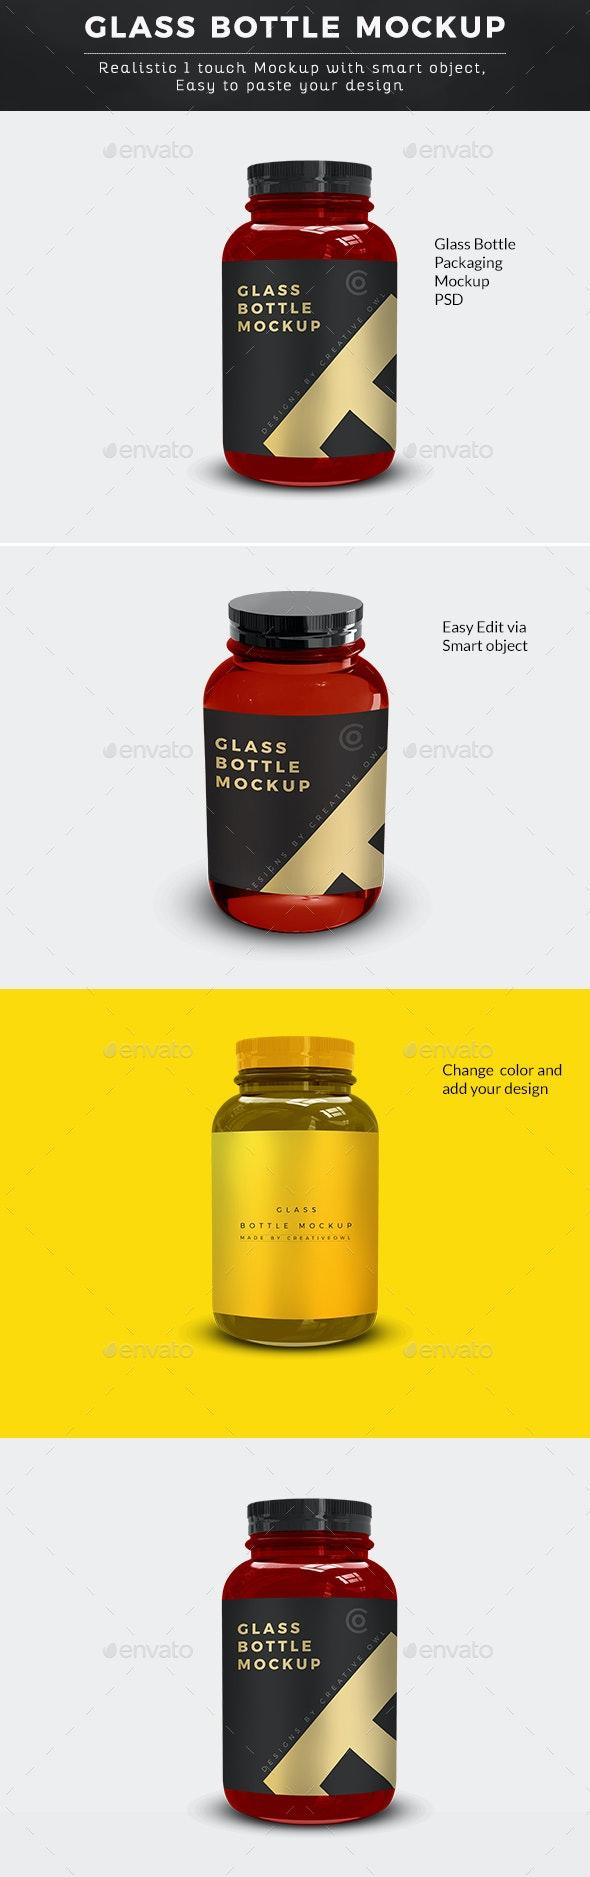 Glass Bottle Supplement Packaging Mockup - Packaging Product Mock-Ups